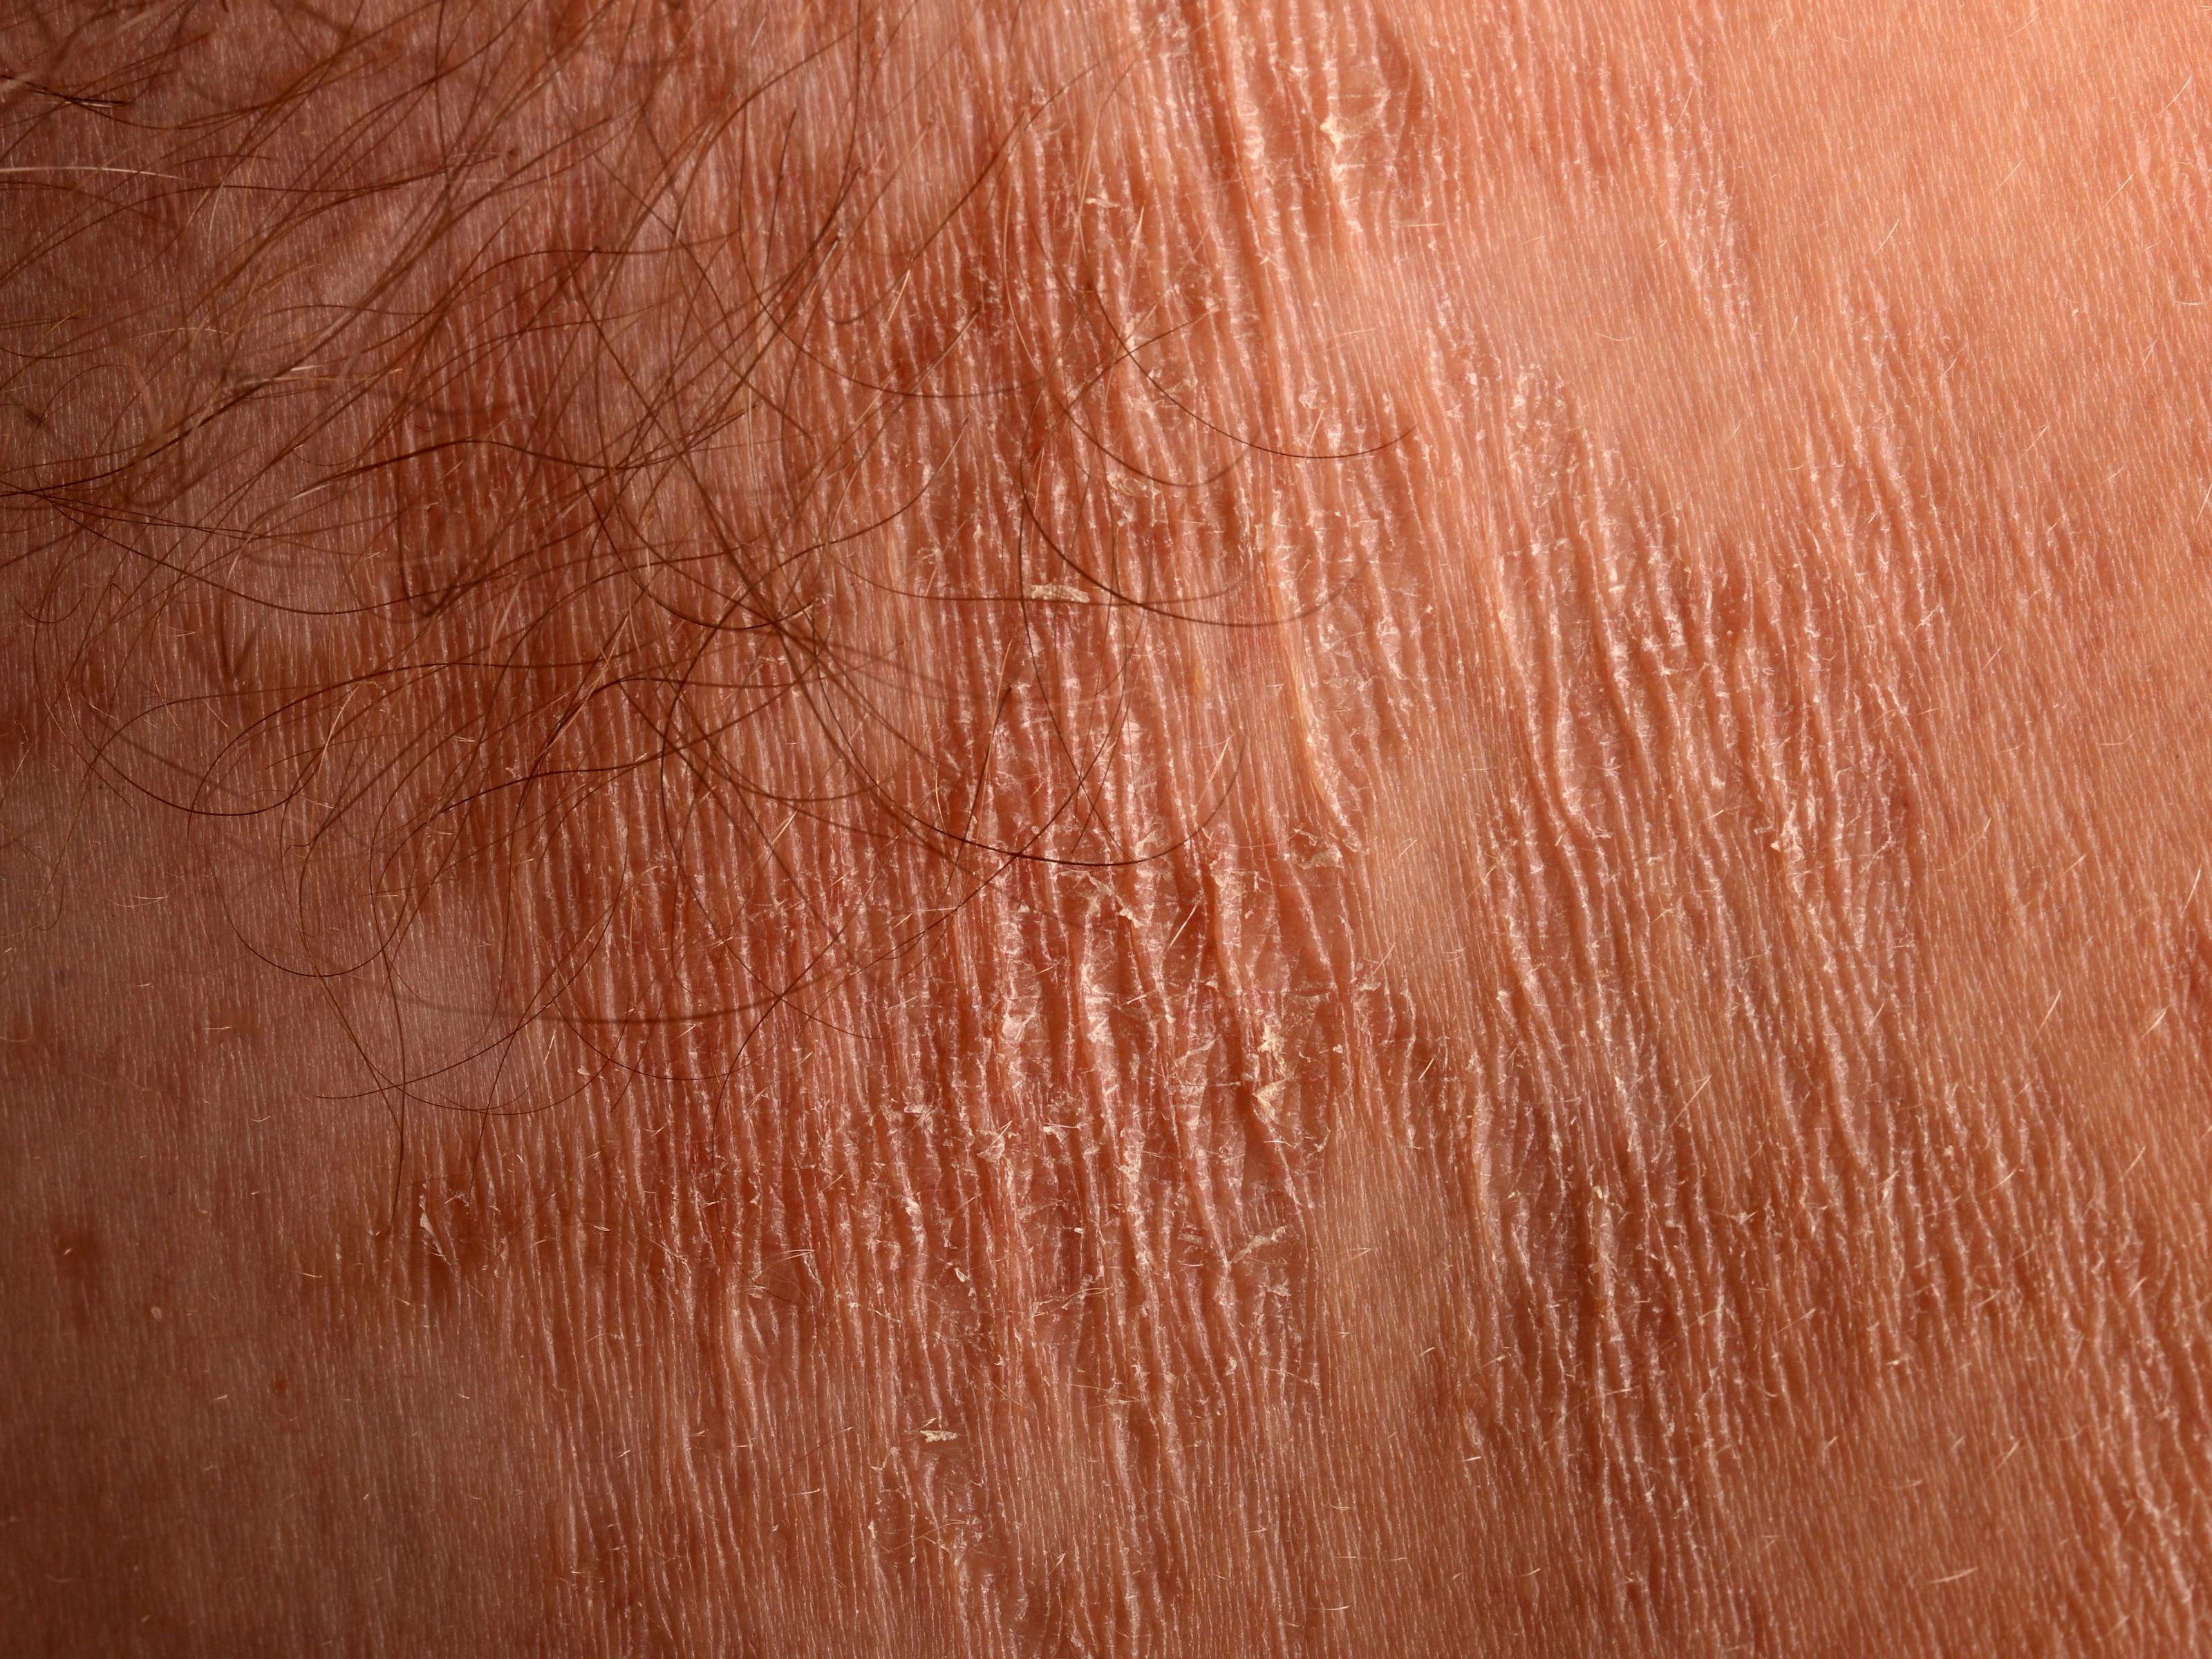 papillomatosis cutis confluens et reticularis papillomavírusos ember kockáztat